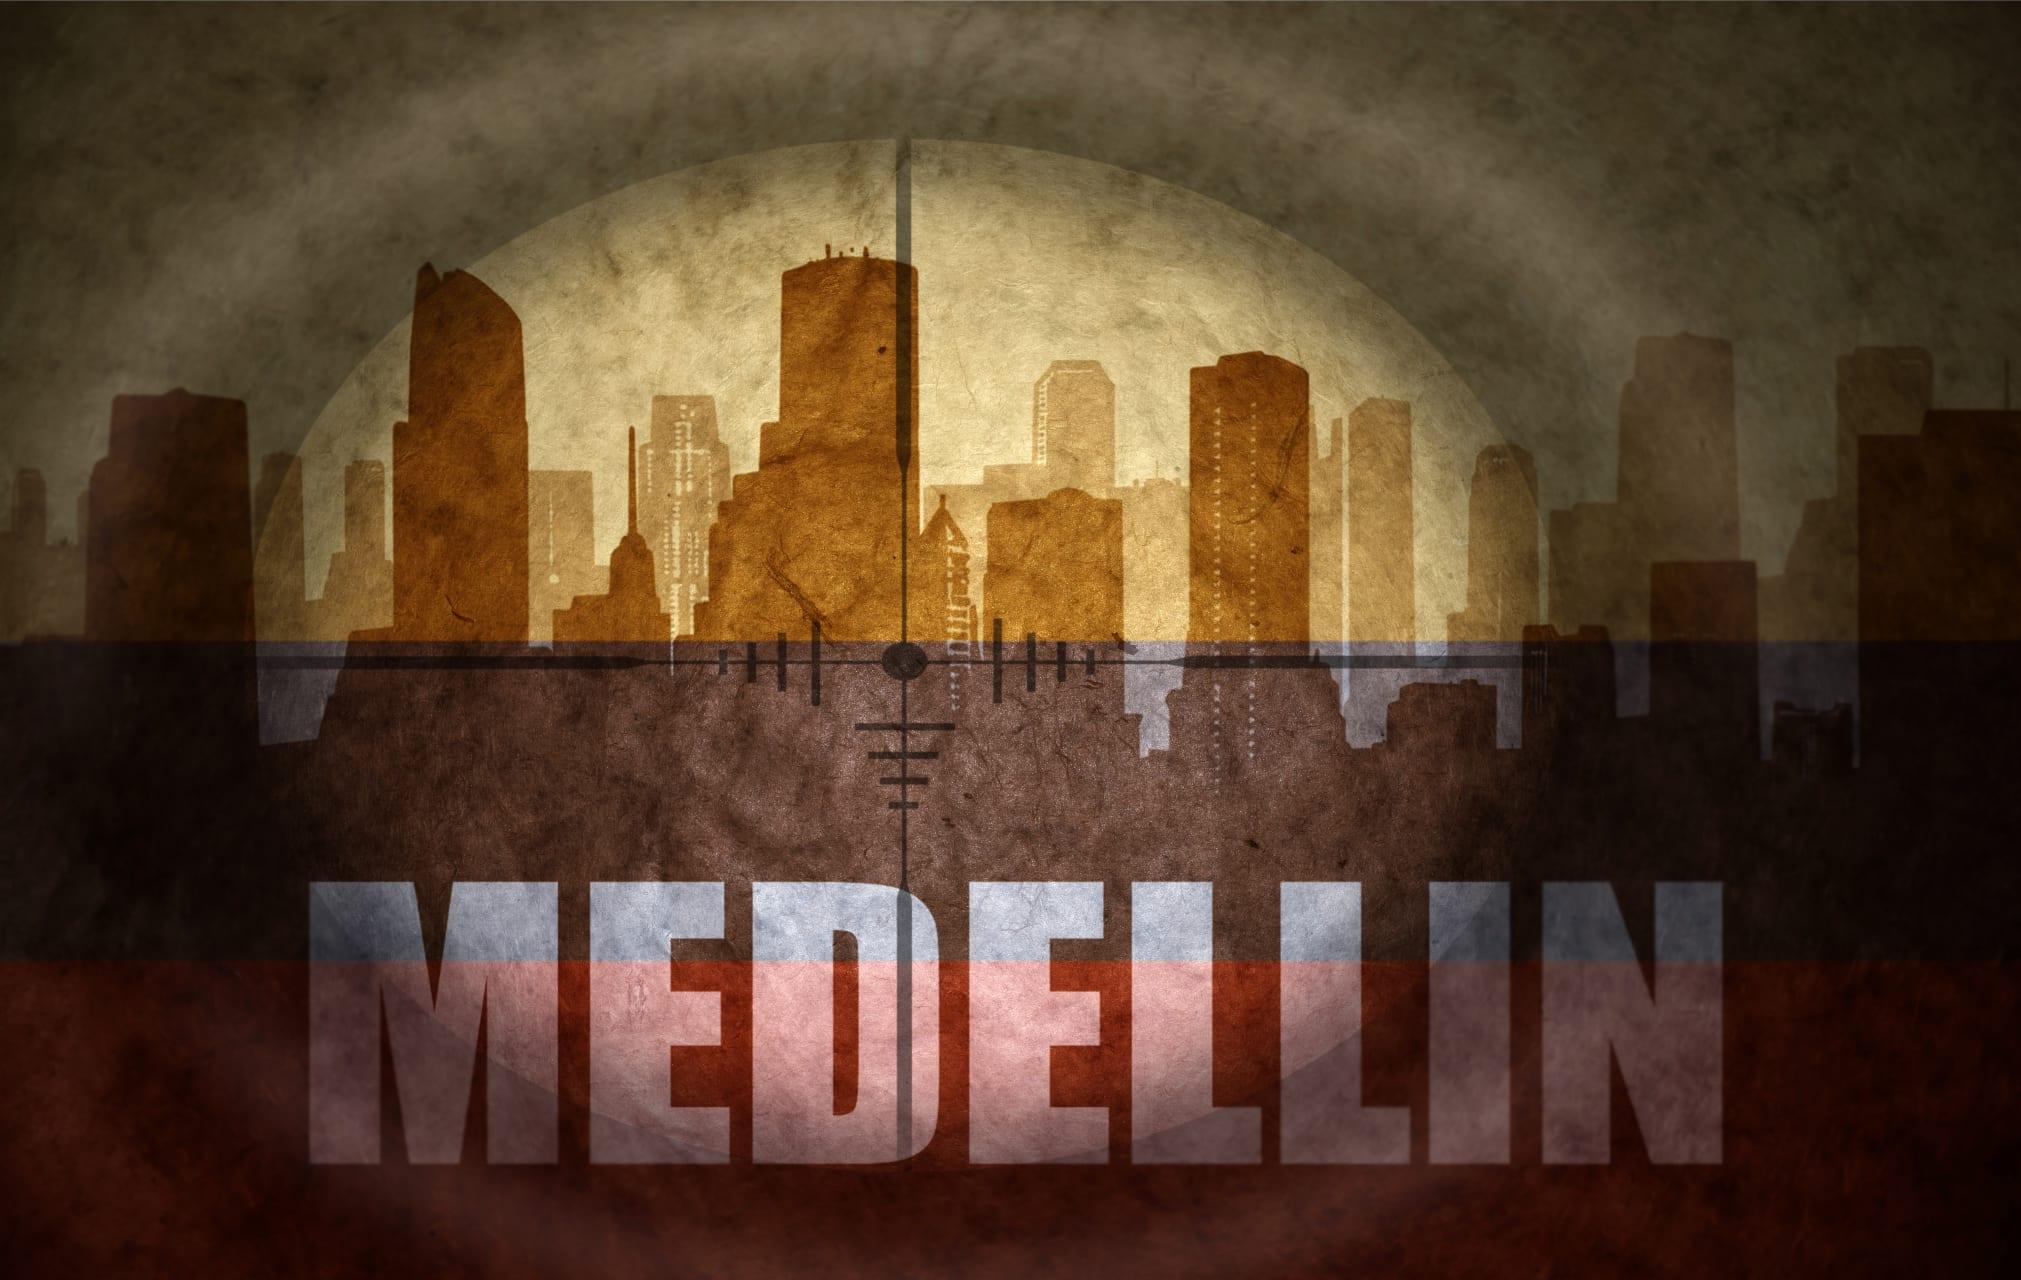 Medellín - The Legacy of Pablo Escobar